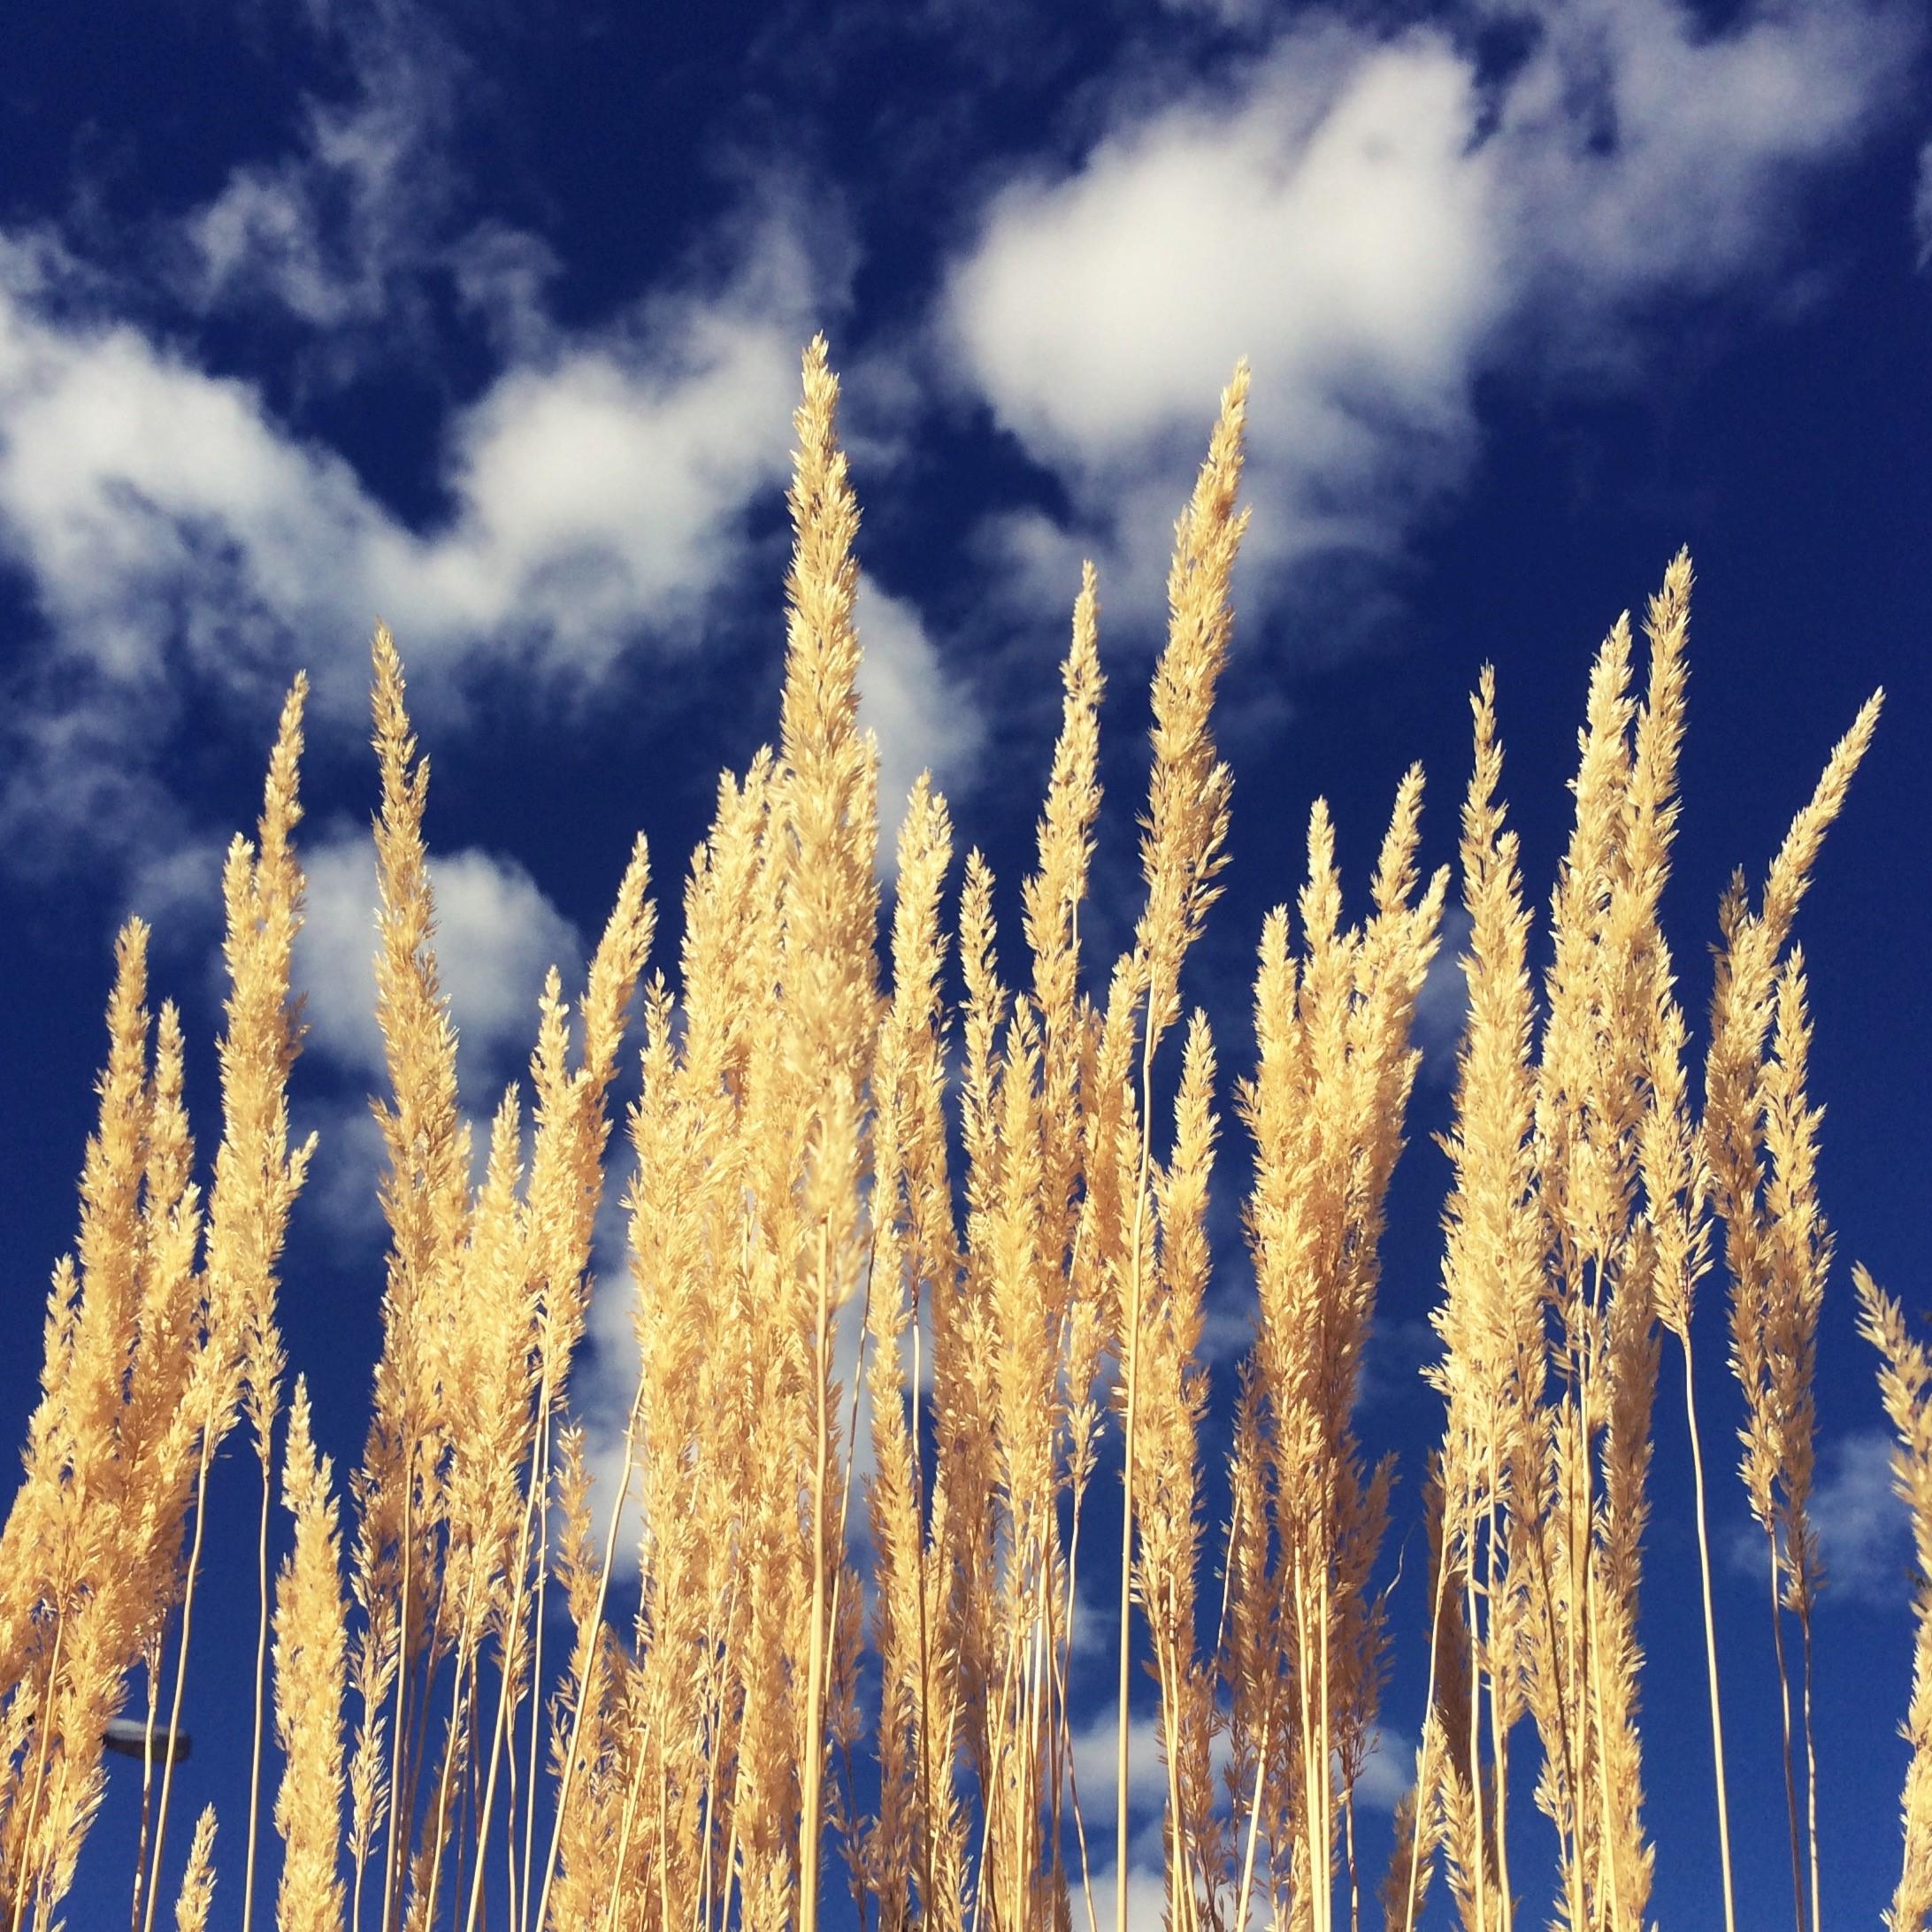 Golden stalks and blue skies.jpg